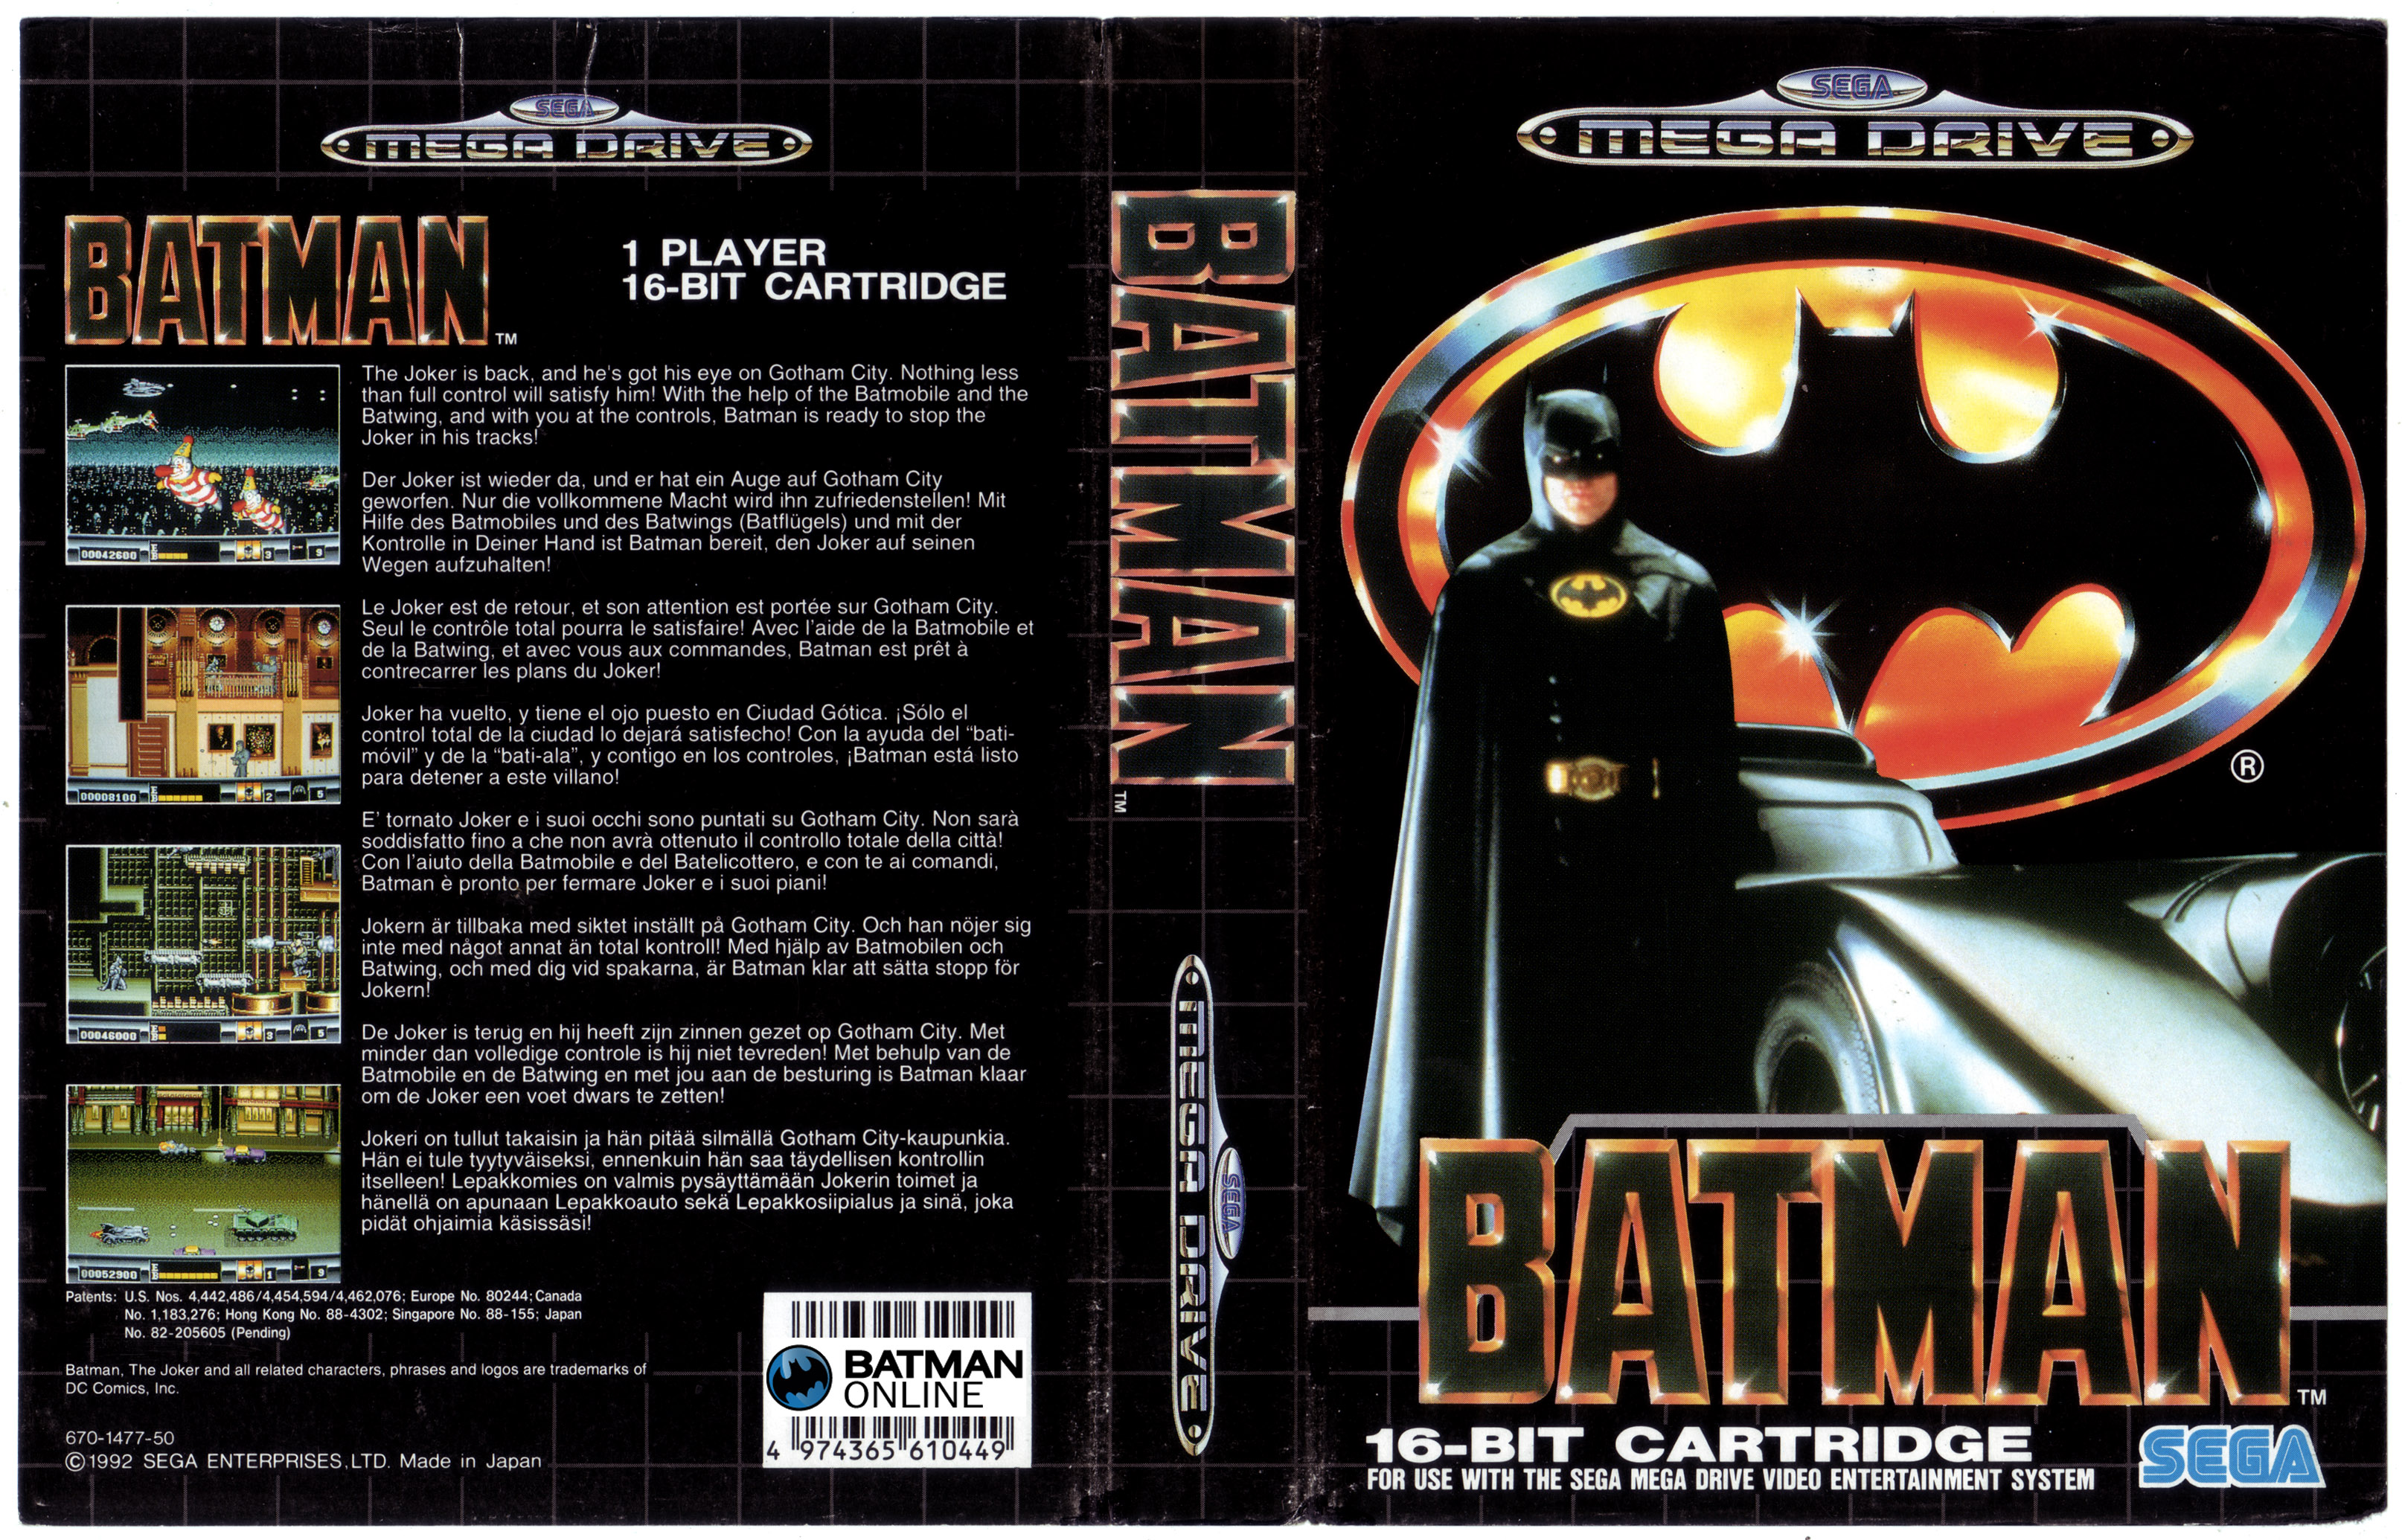 http://www.batman-online.com/images/13830519979806.jpg